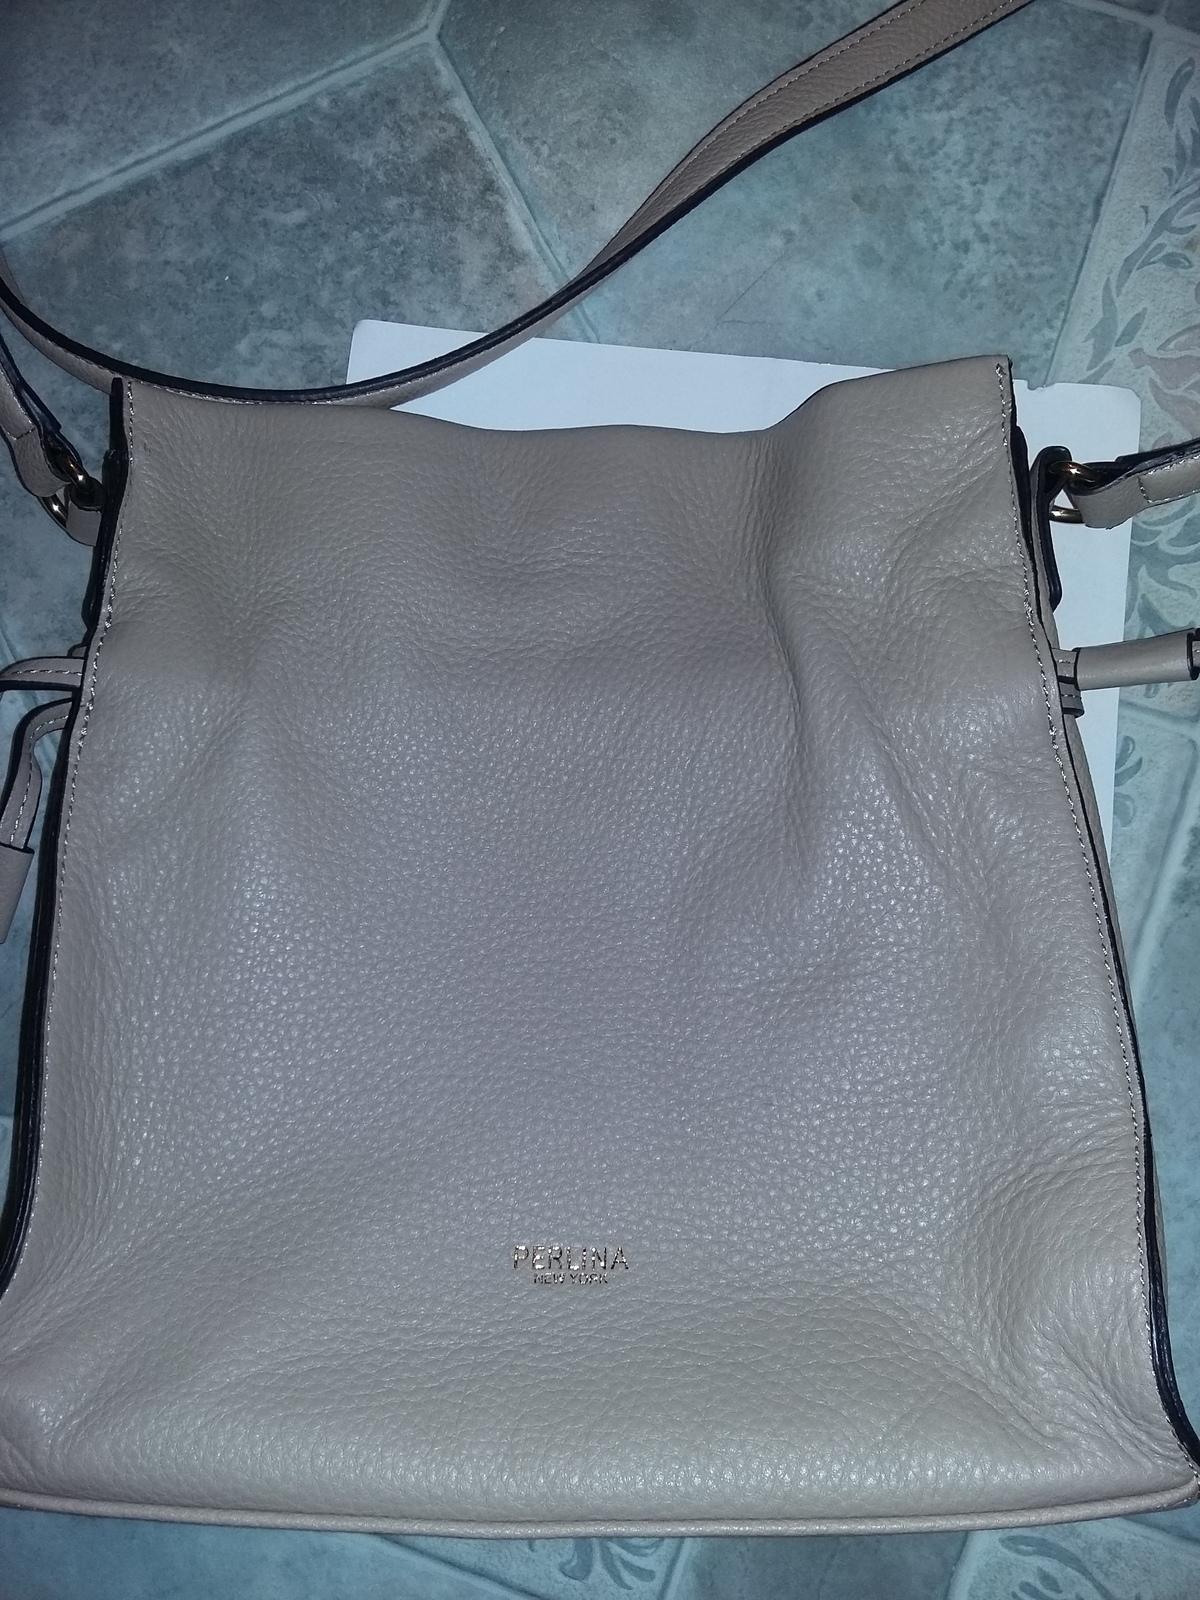 Perlina Bag 1 Customer Review And 2